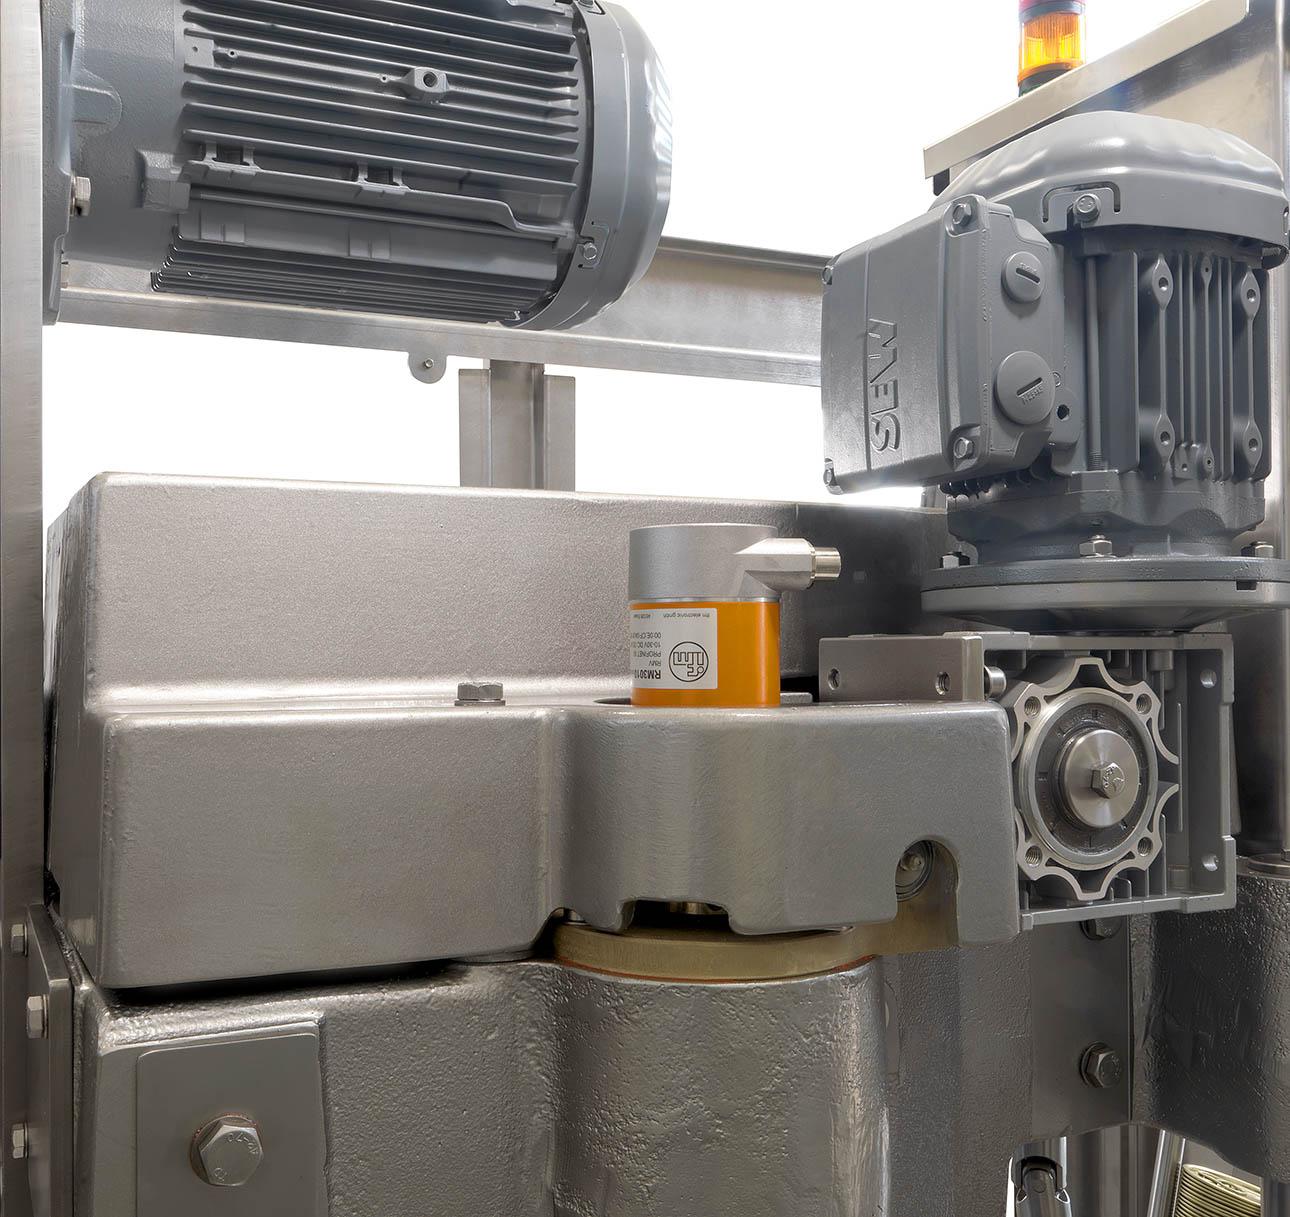 k40 encoder aggraffatrice automatica linea economica bonicomm